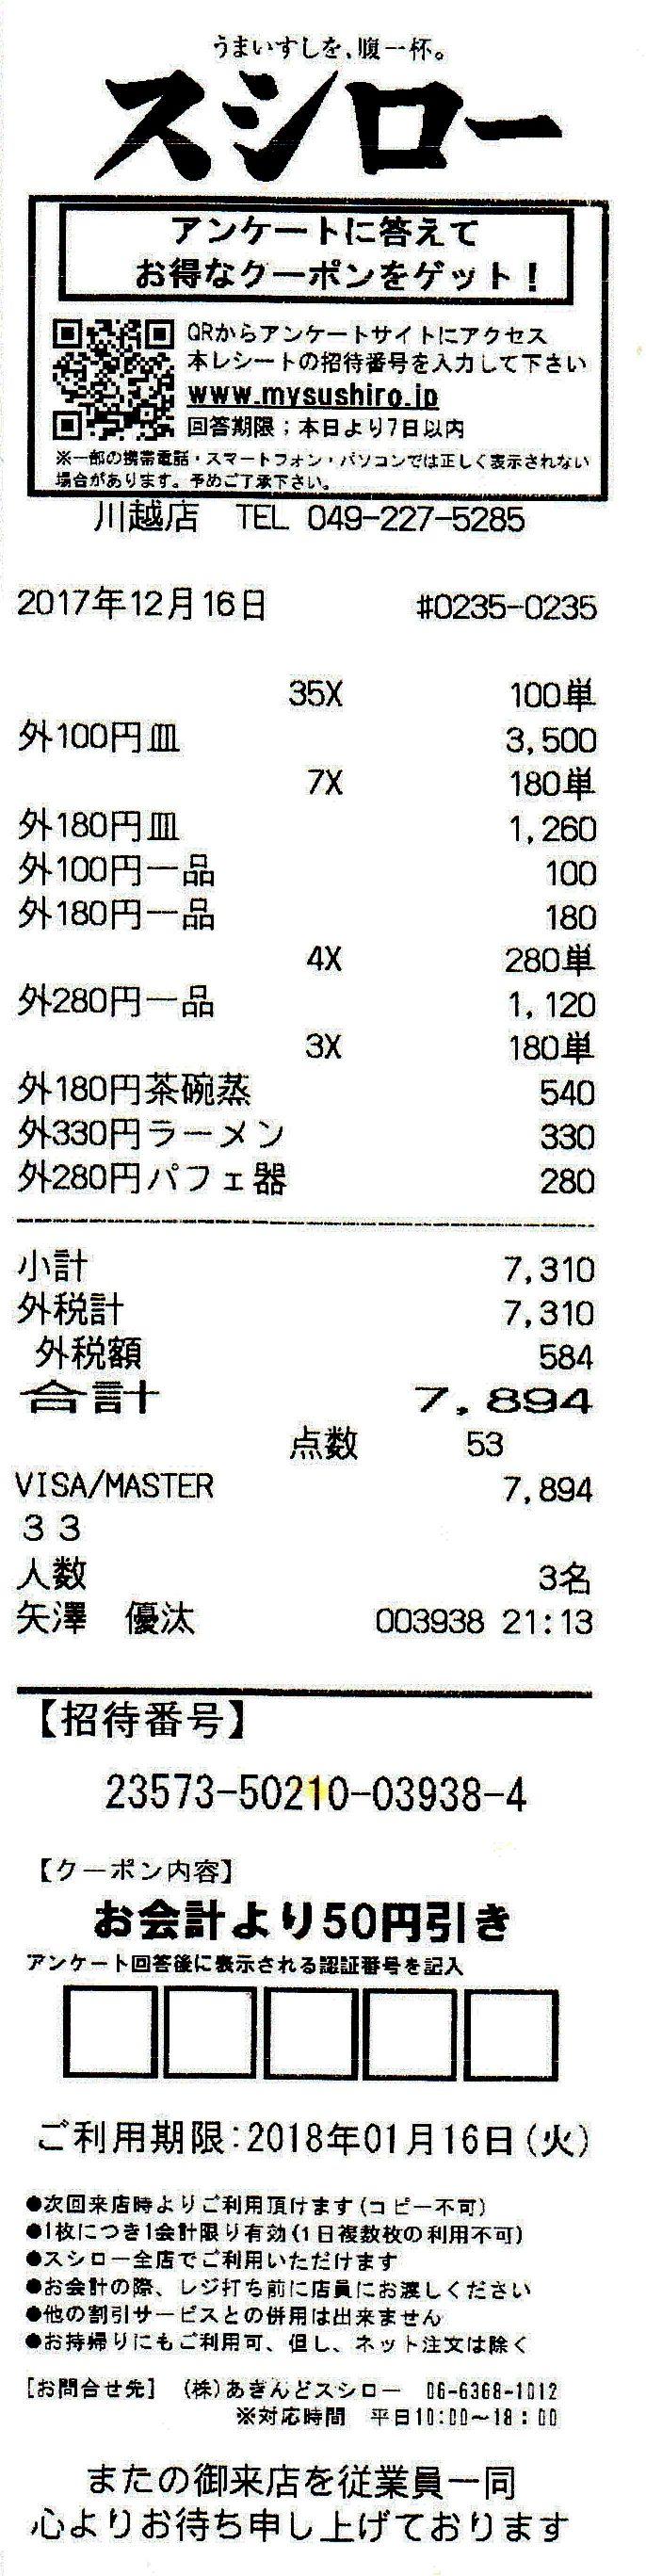 www mysushiro jp レシート アンケート